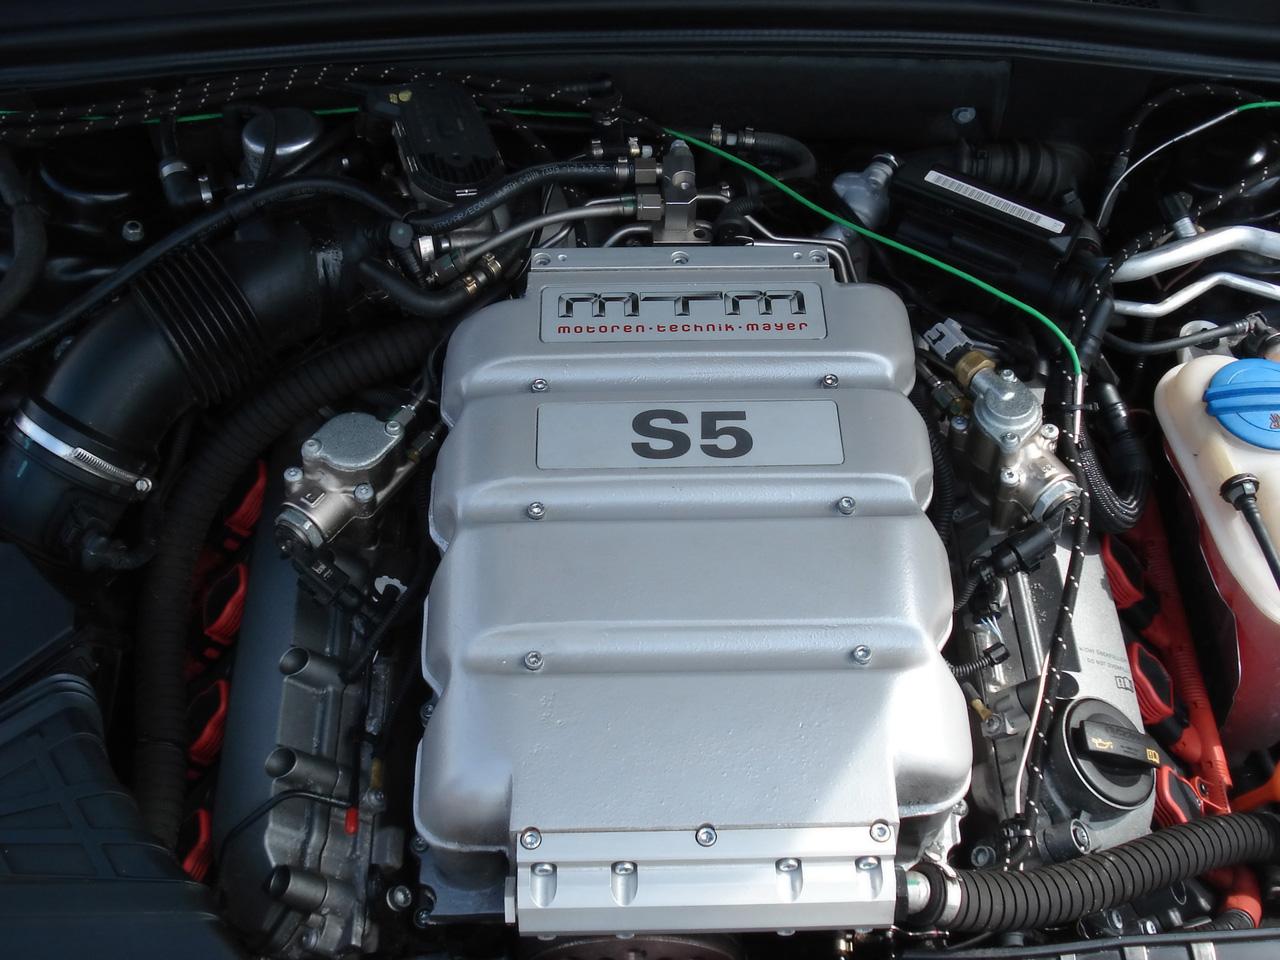 2008-MTM-Audi-S5-GT-Supercharged-Engine-1280x960.jpg